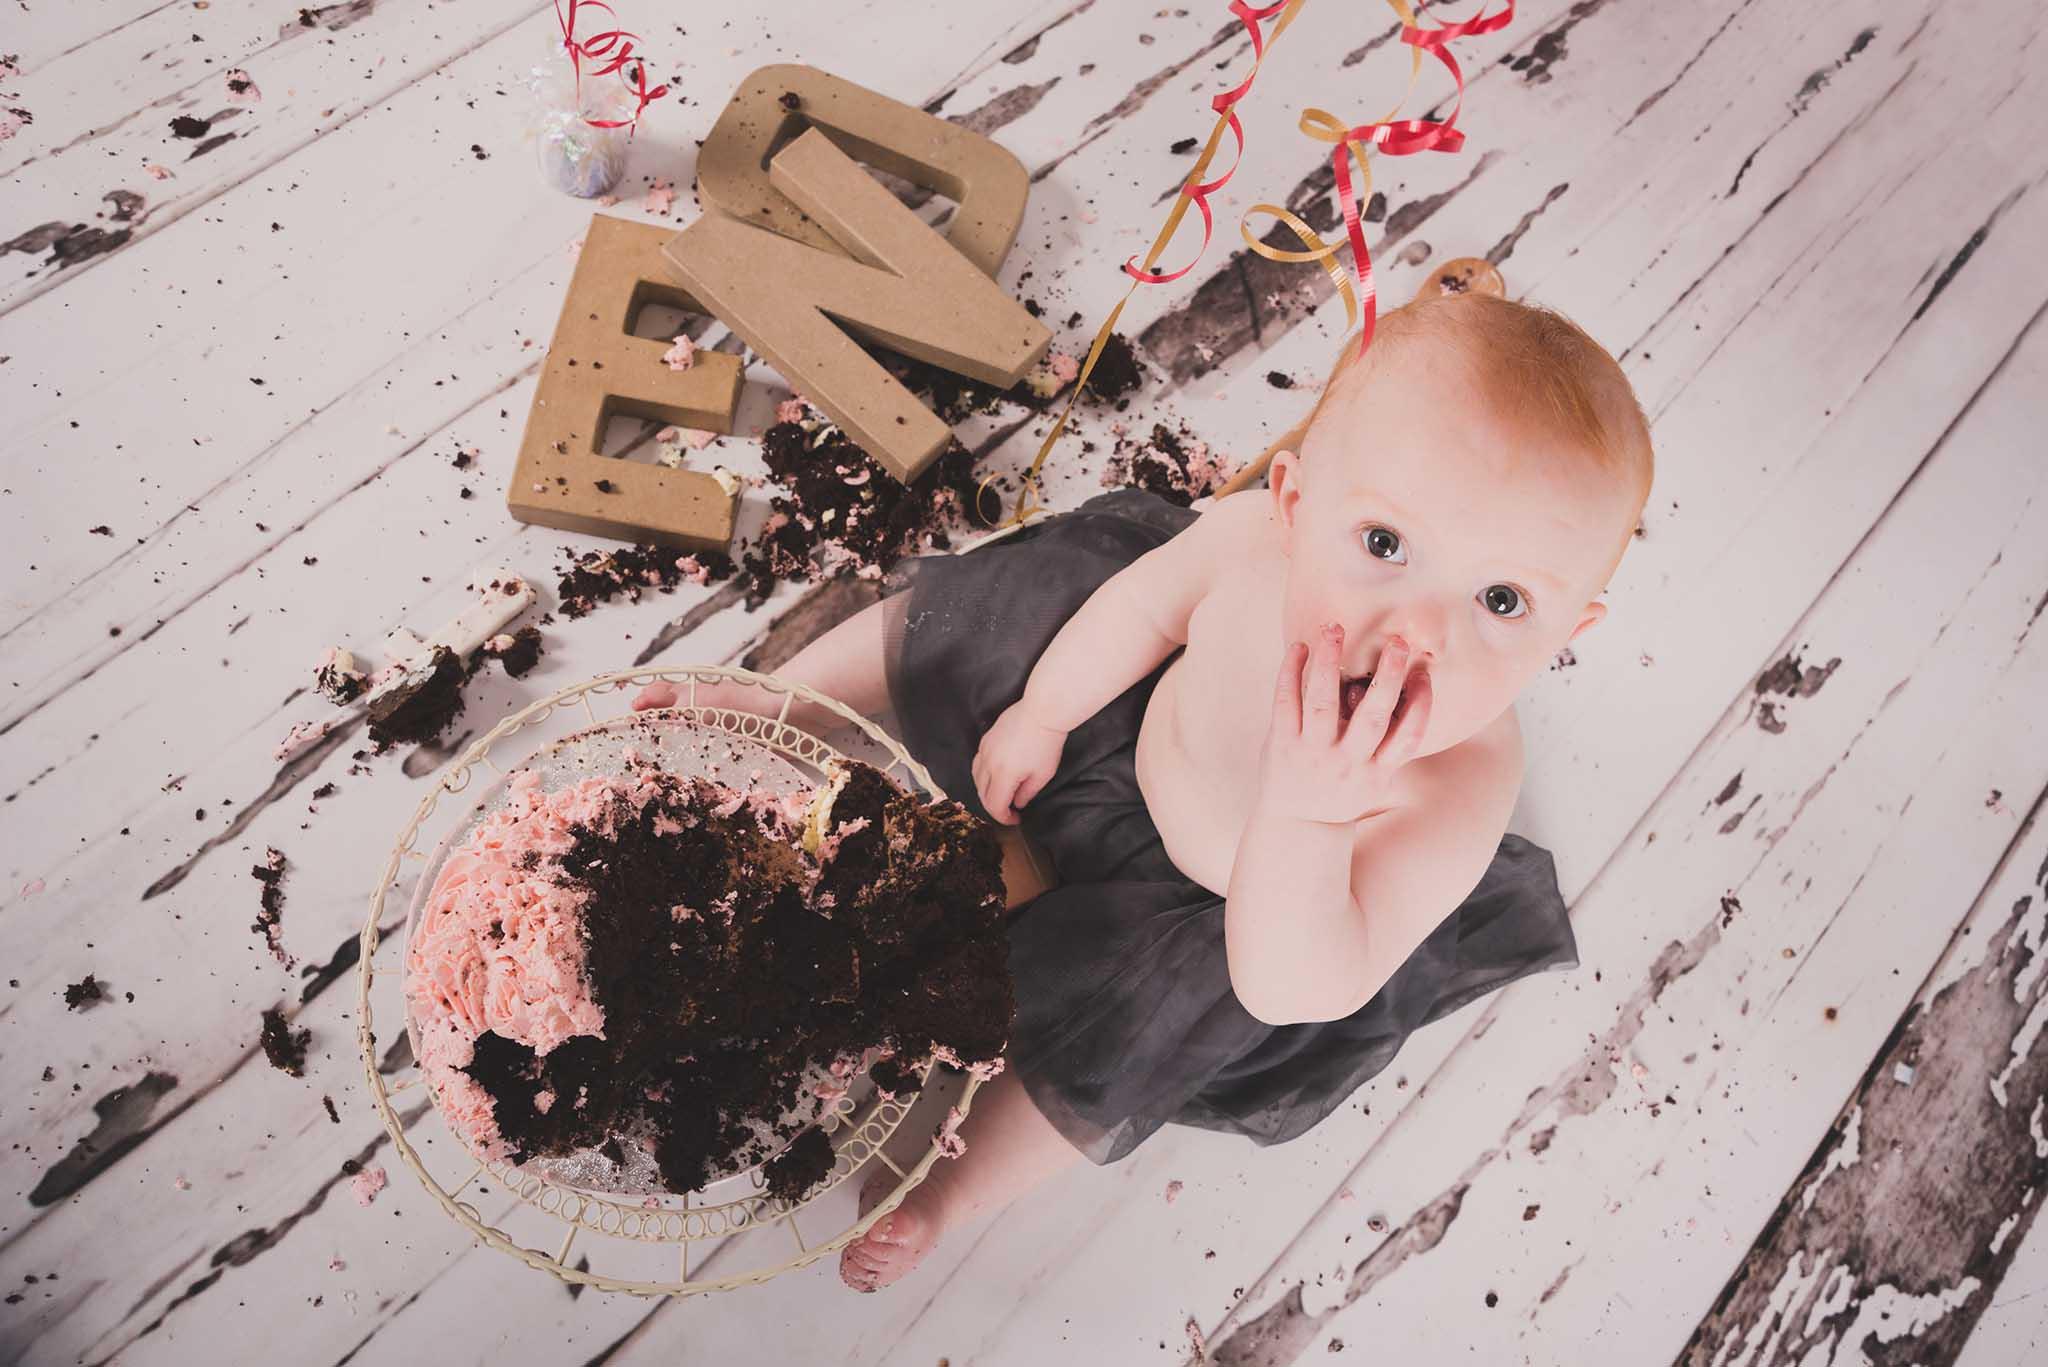 Louth Photographer: Mollie's birthday cake smash